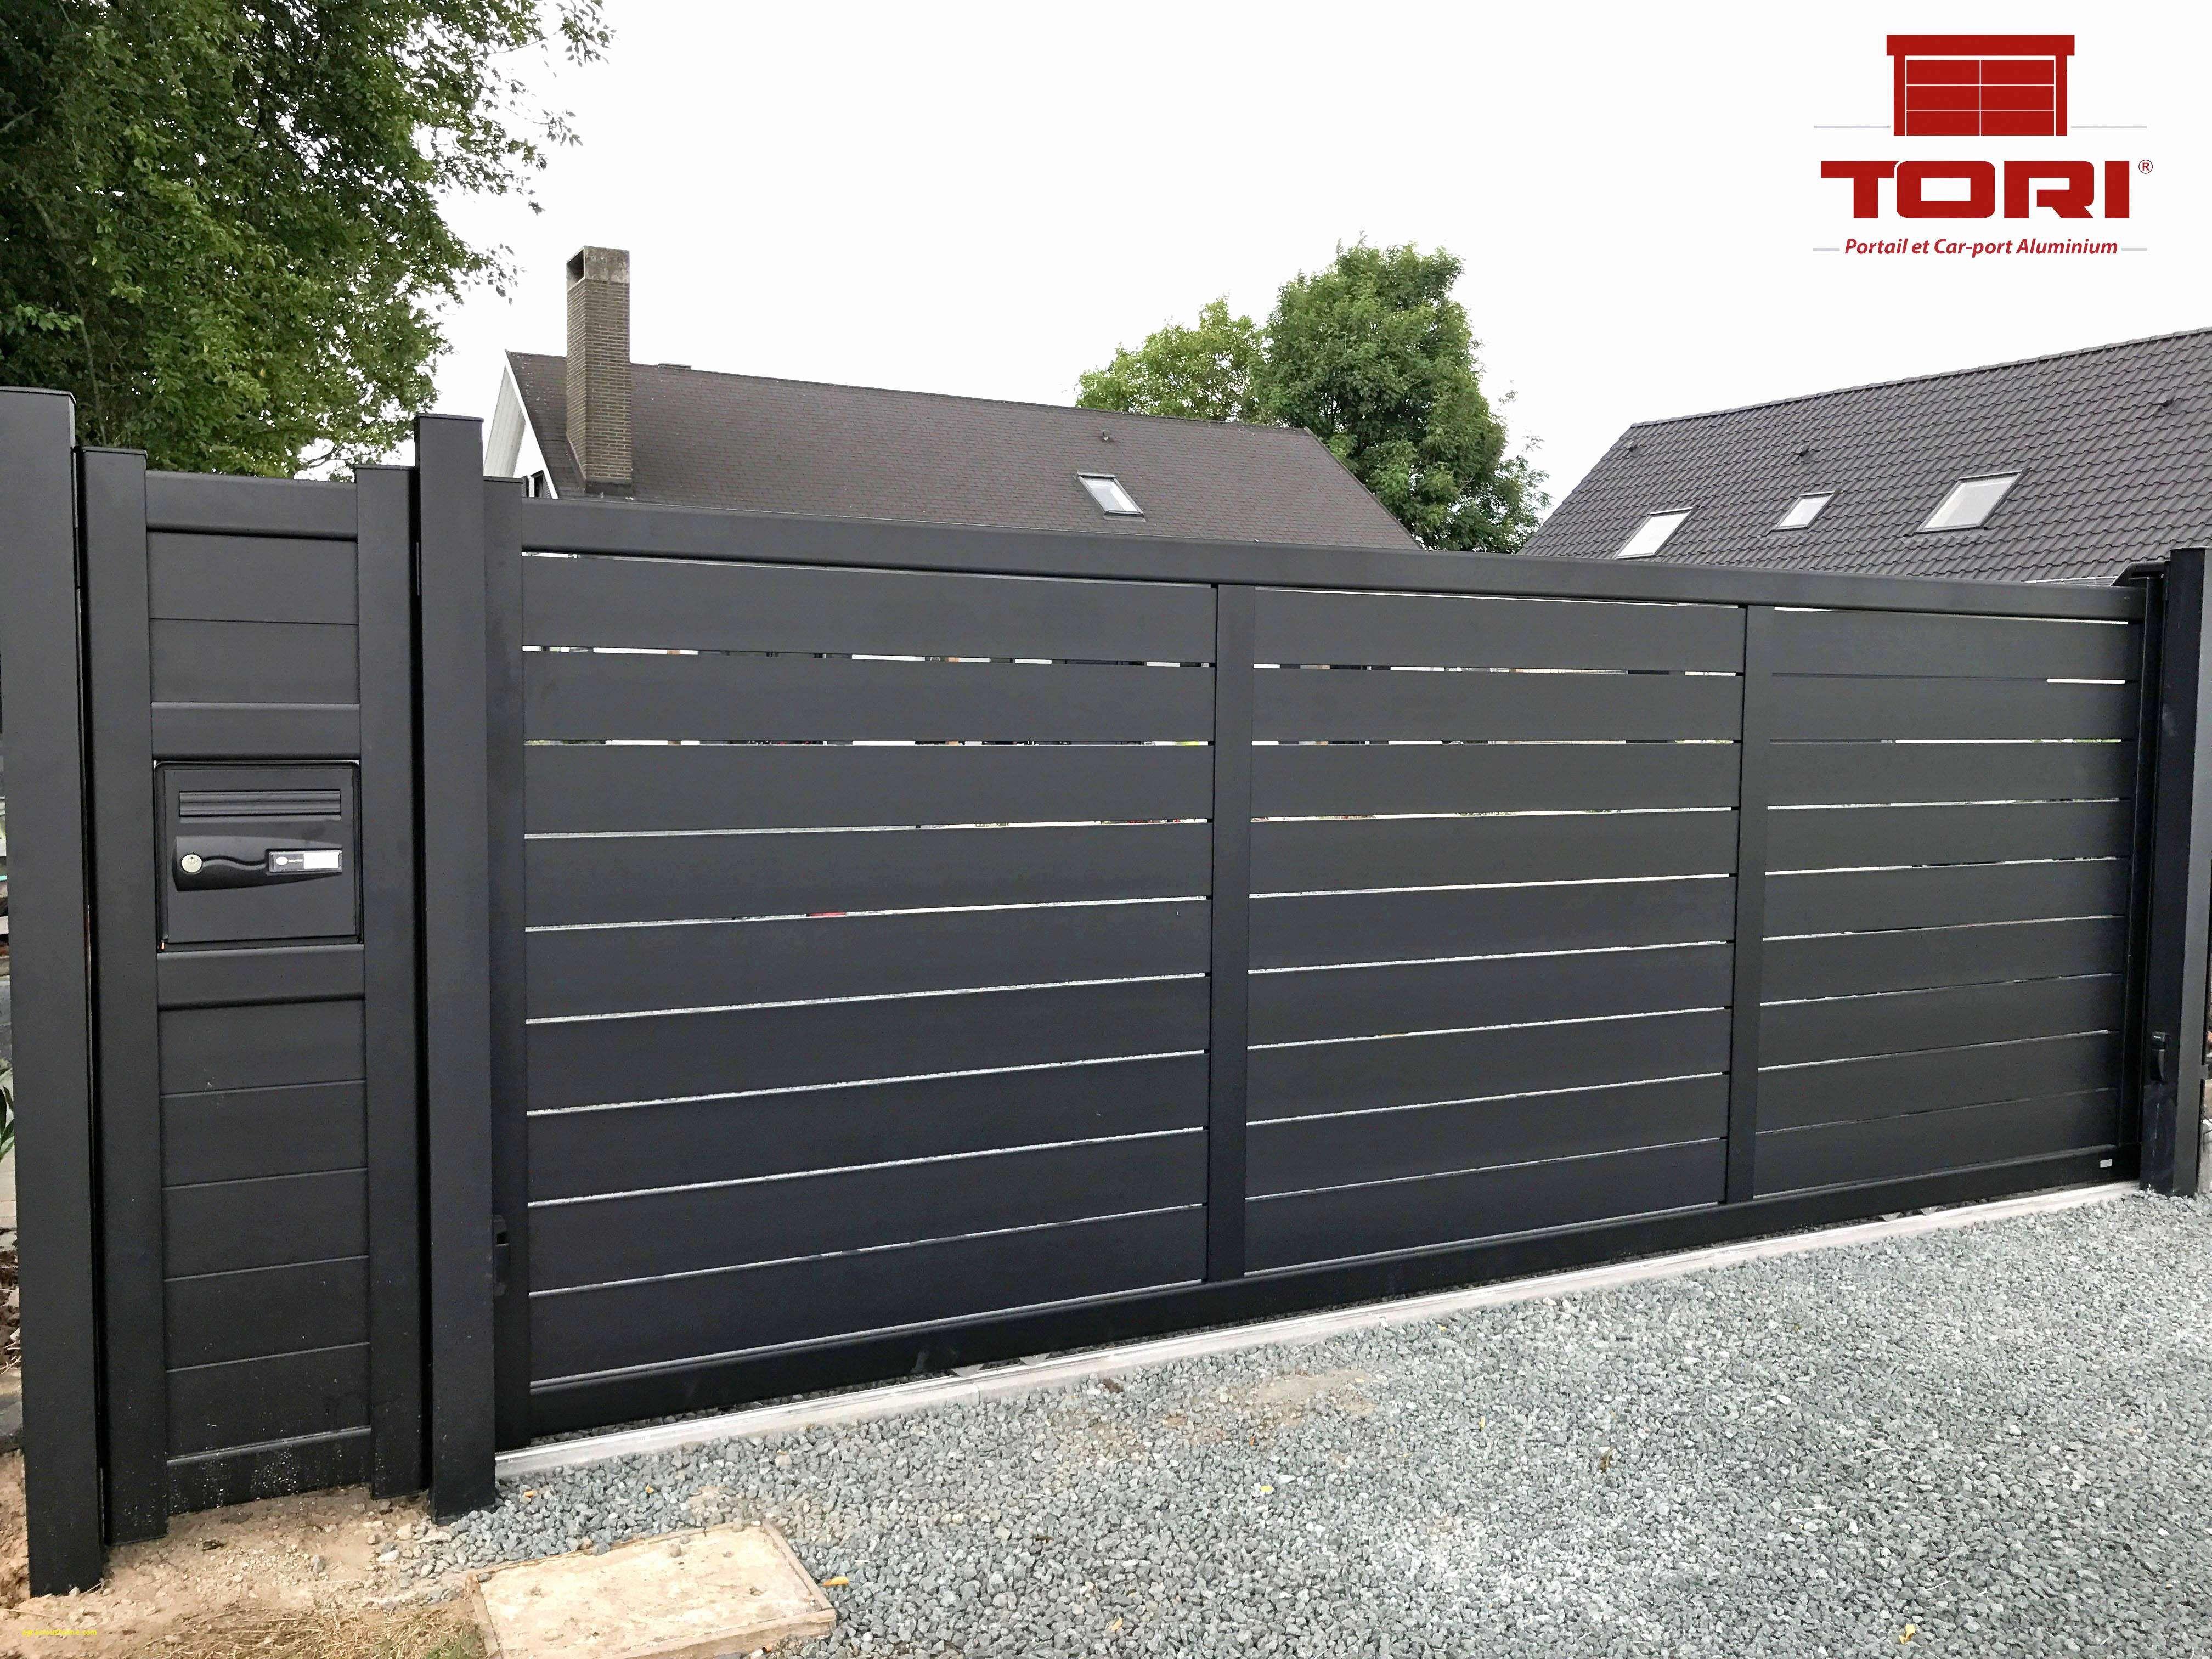 Luxus 40 Fur Wpc Zaun Polen Check More At Https Www Estadoproperties Com Wpc Zaun Polen House Gate Design Door Gate Design Driveway Design